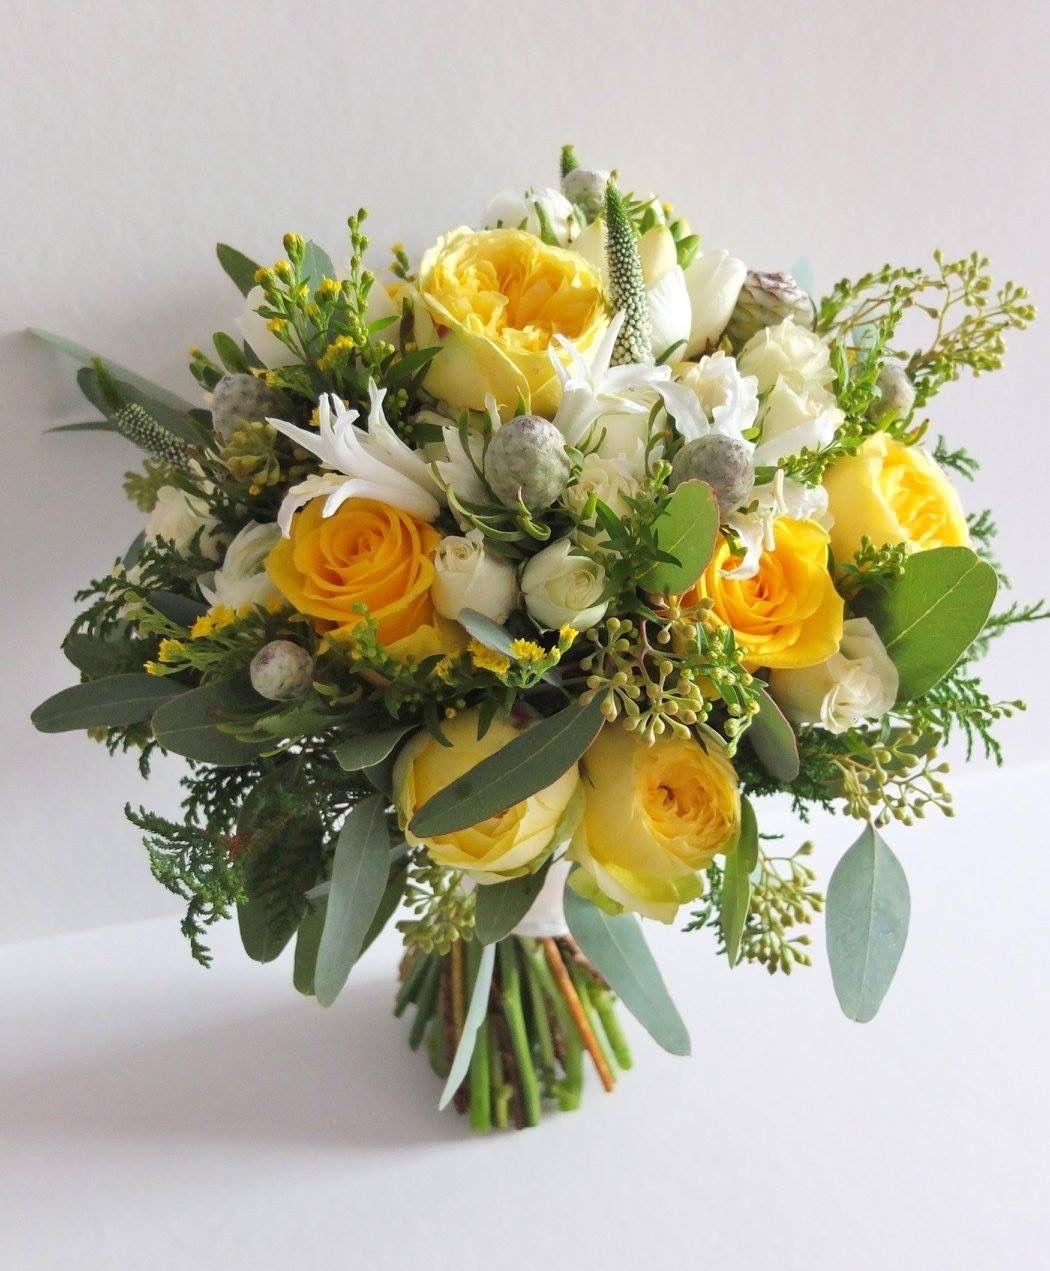 Beautiful Flower Arrangements For Weddings: Beautiful Flower Arrangement